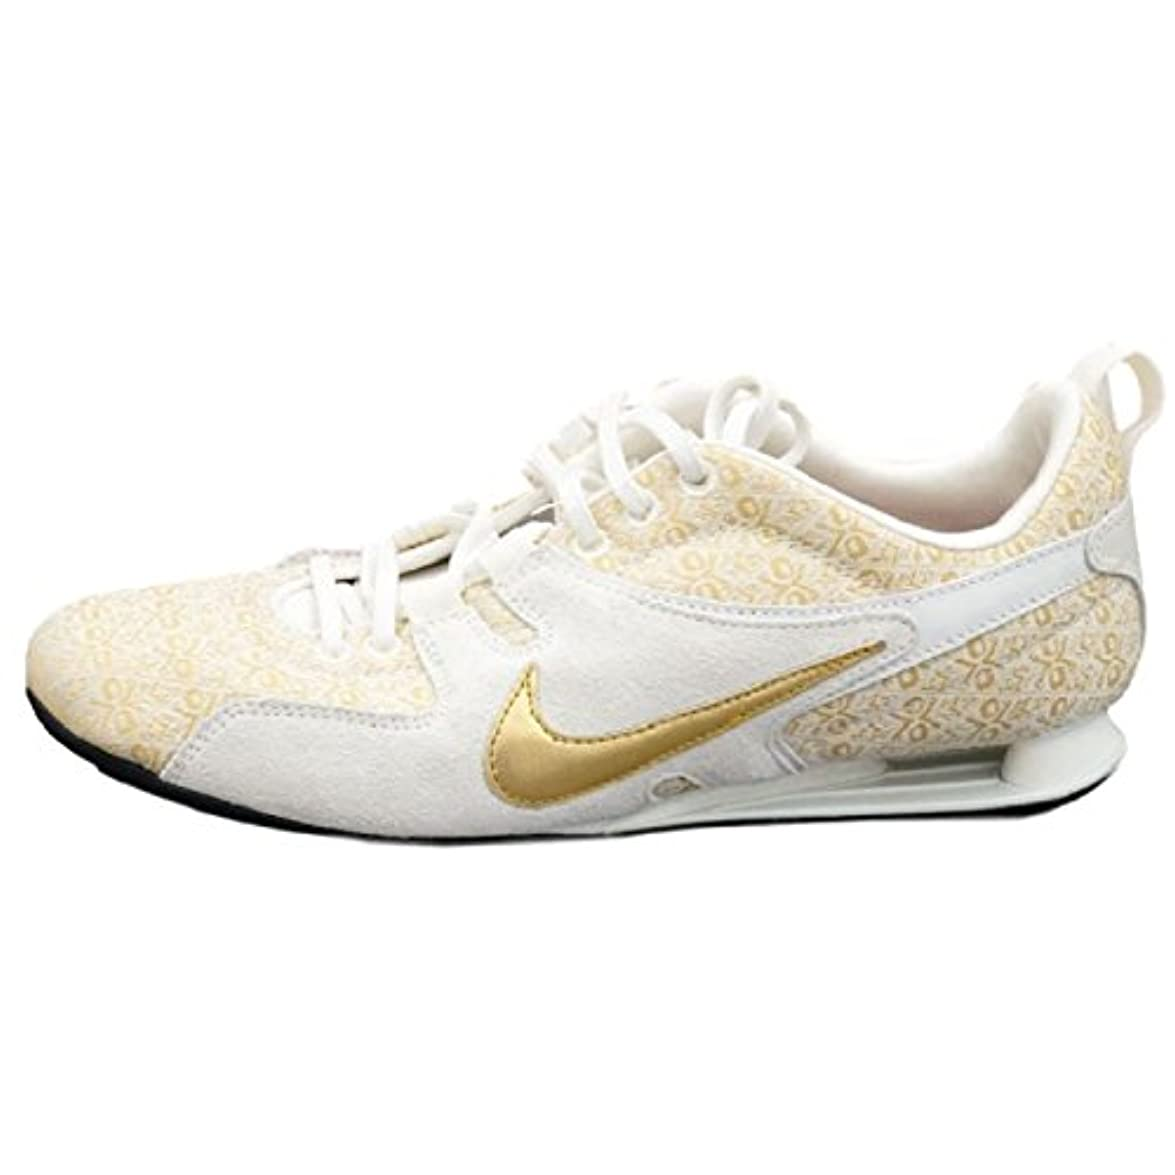 Nike Sneaker Donna Oro Gold creme